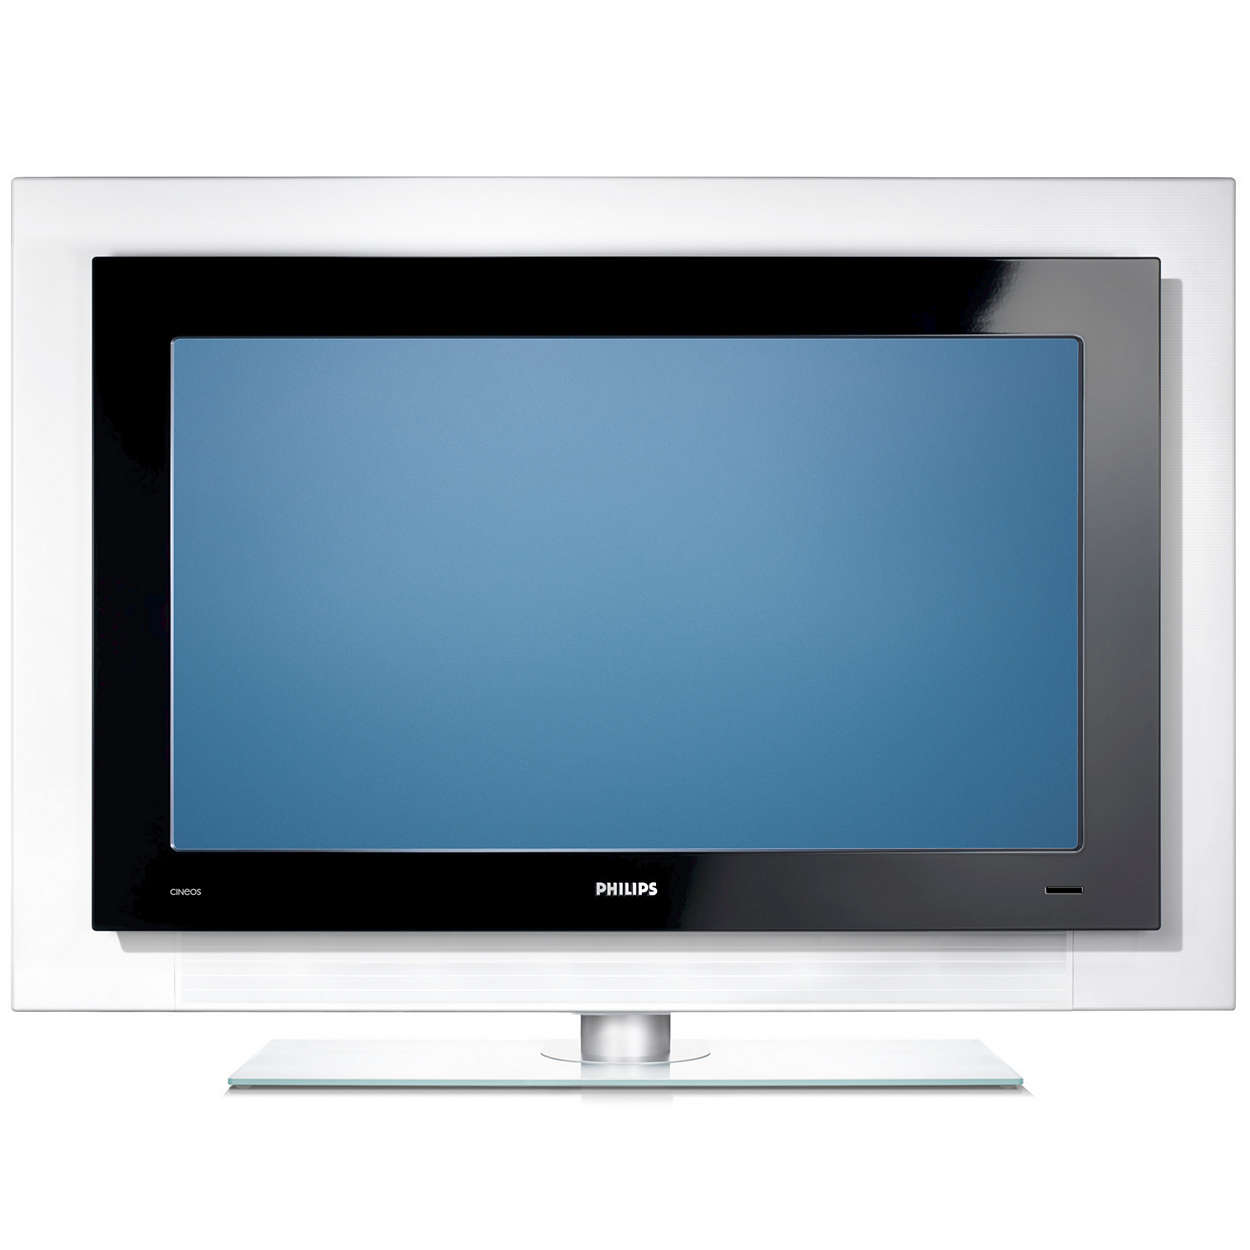 breitbild flachbildfernseher 42pf9831d 10 philips. Black Bedroom Furniture Sets. Home Design Ideas